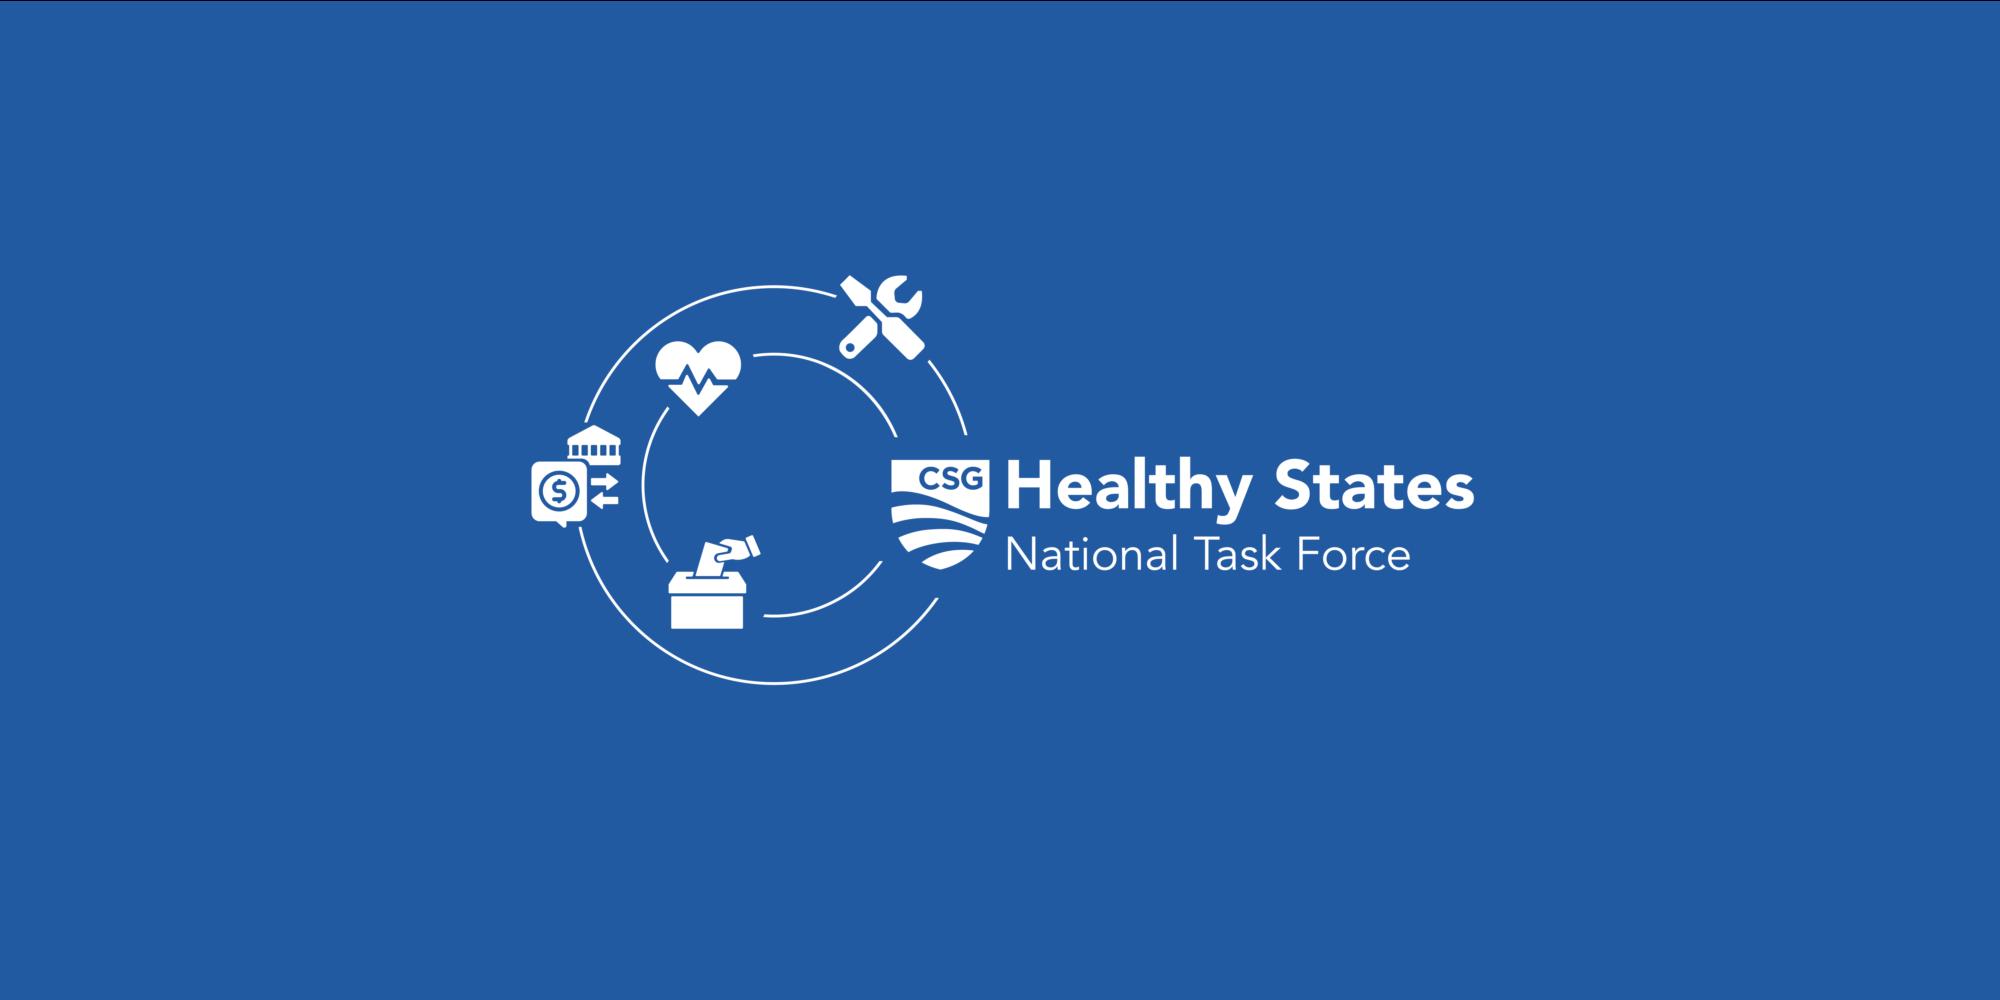 CSG Healthy States